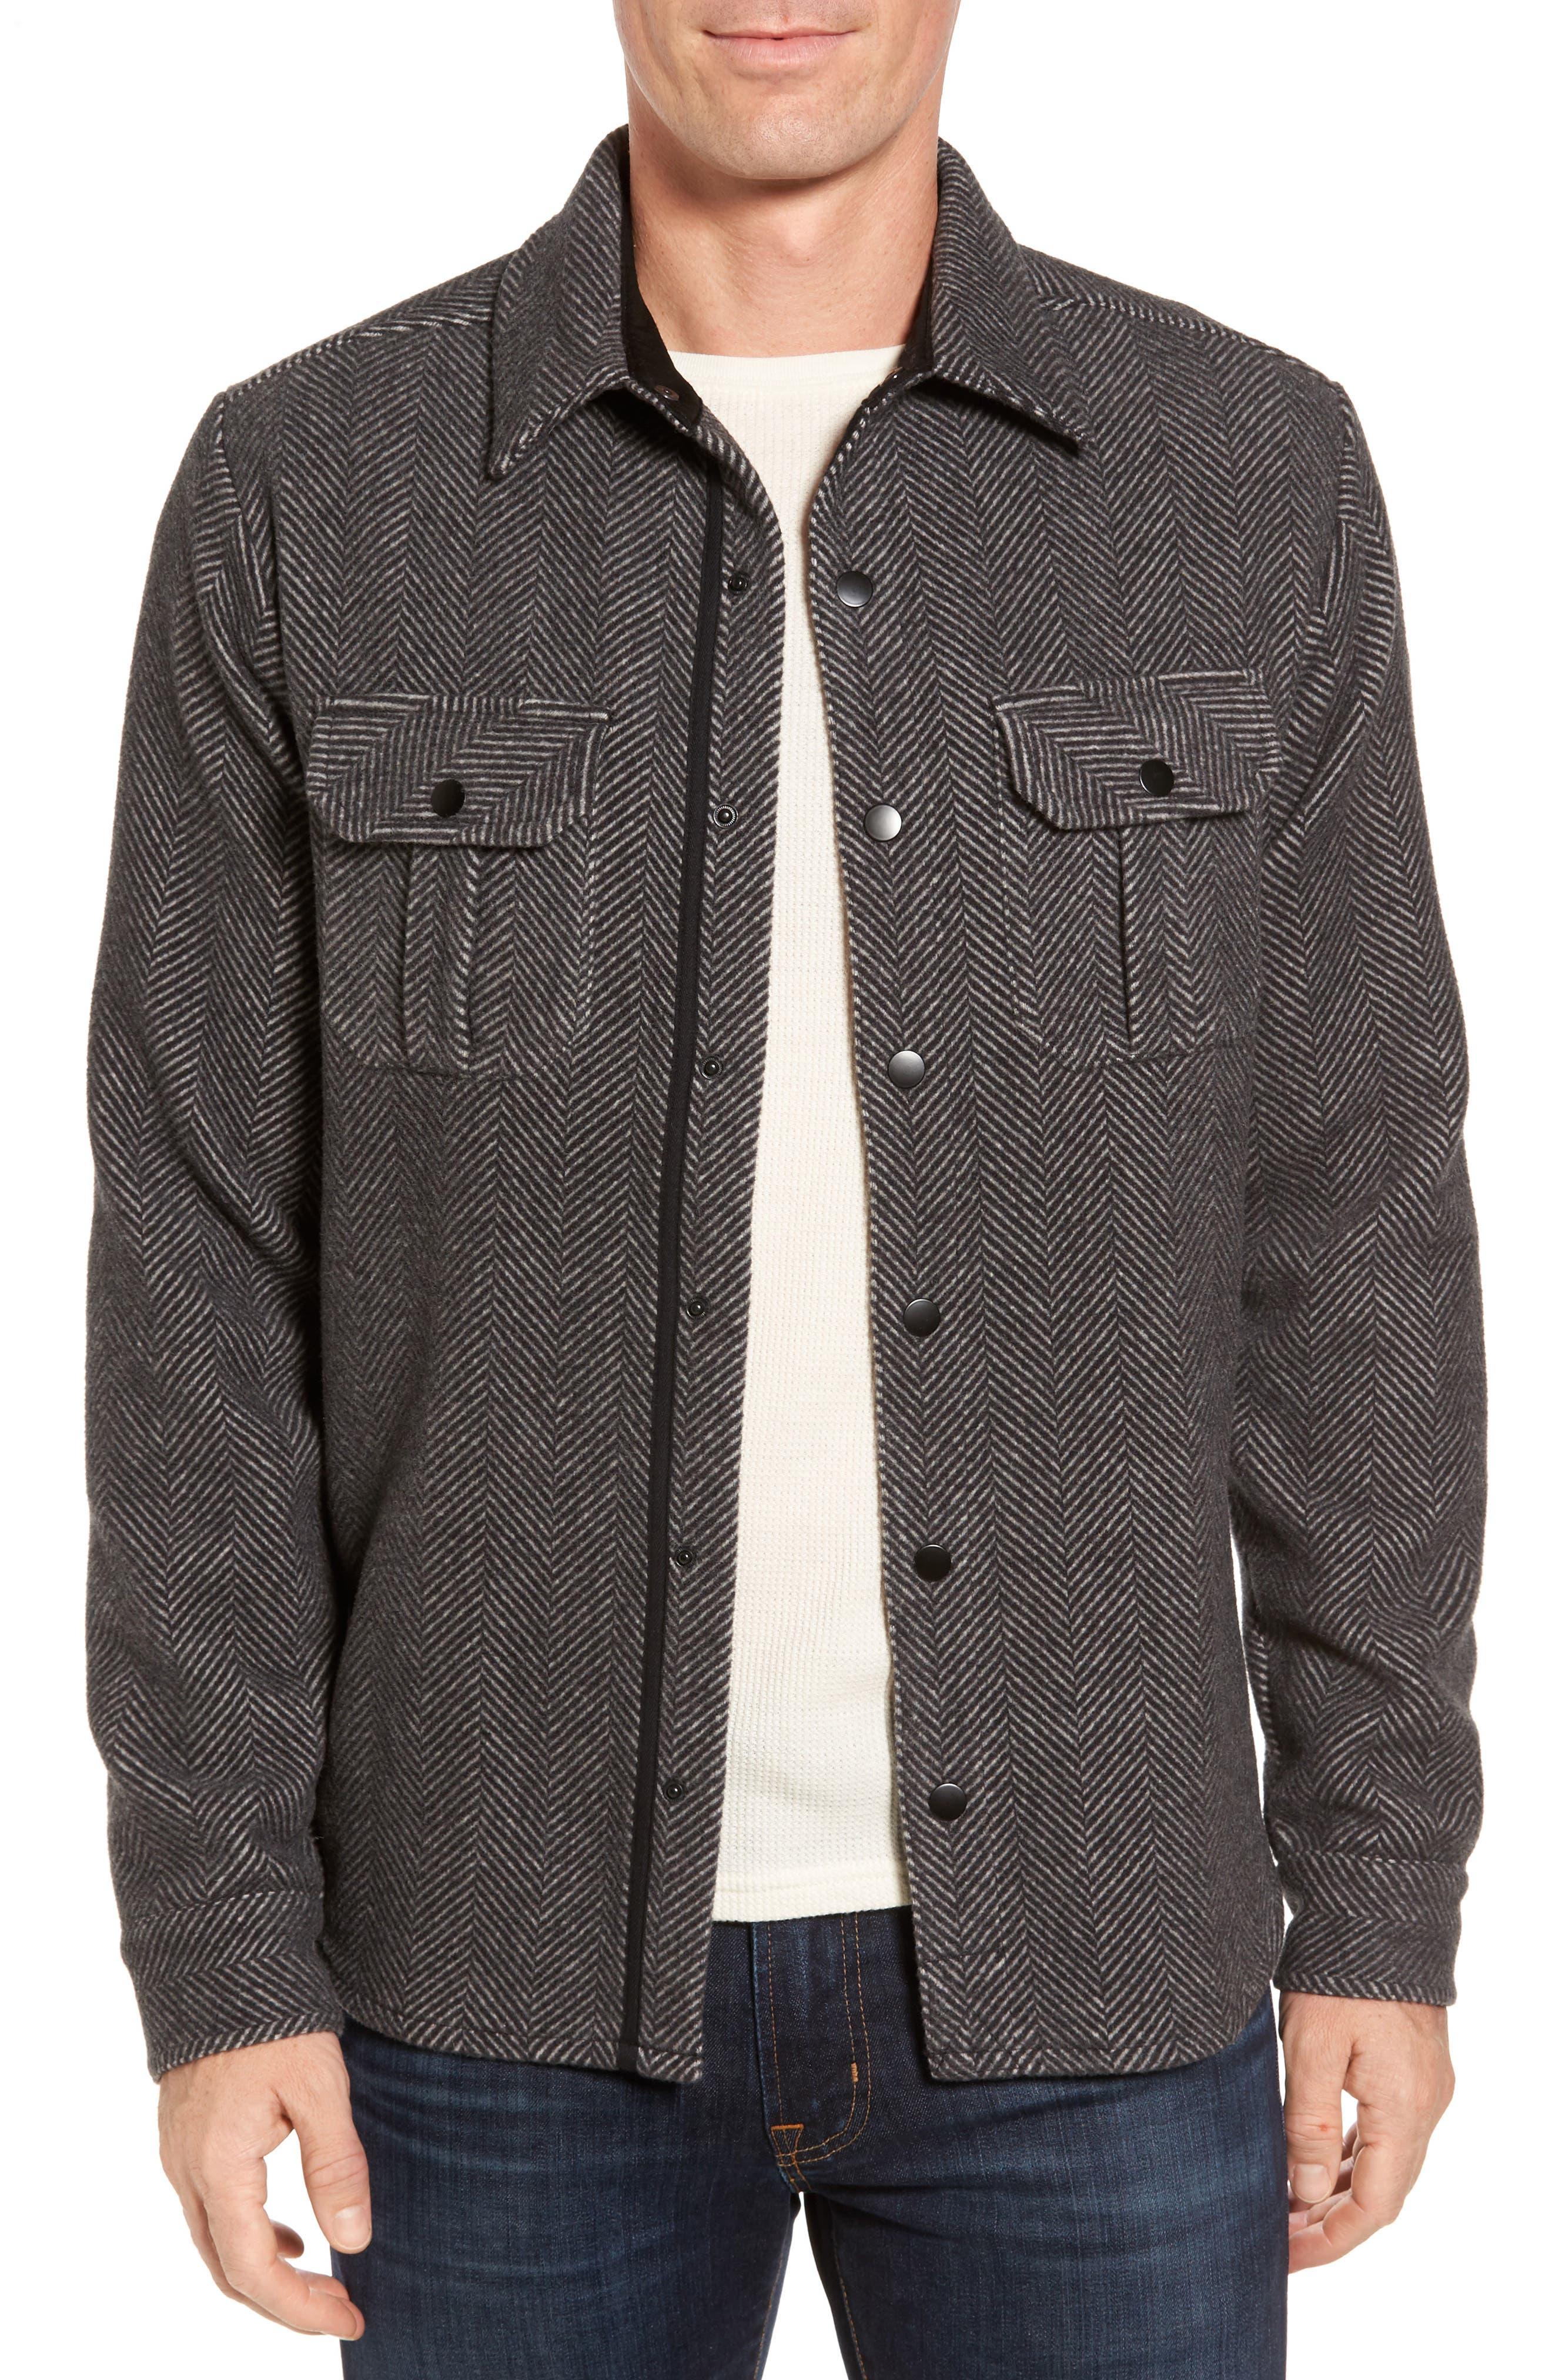 Main Image - SmartWool Anchor Line Herringbone Wool Blend Shirt Jacket